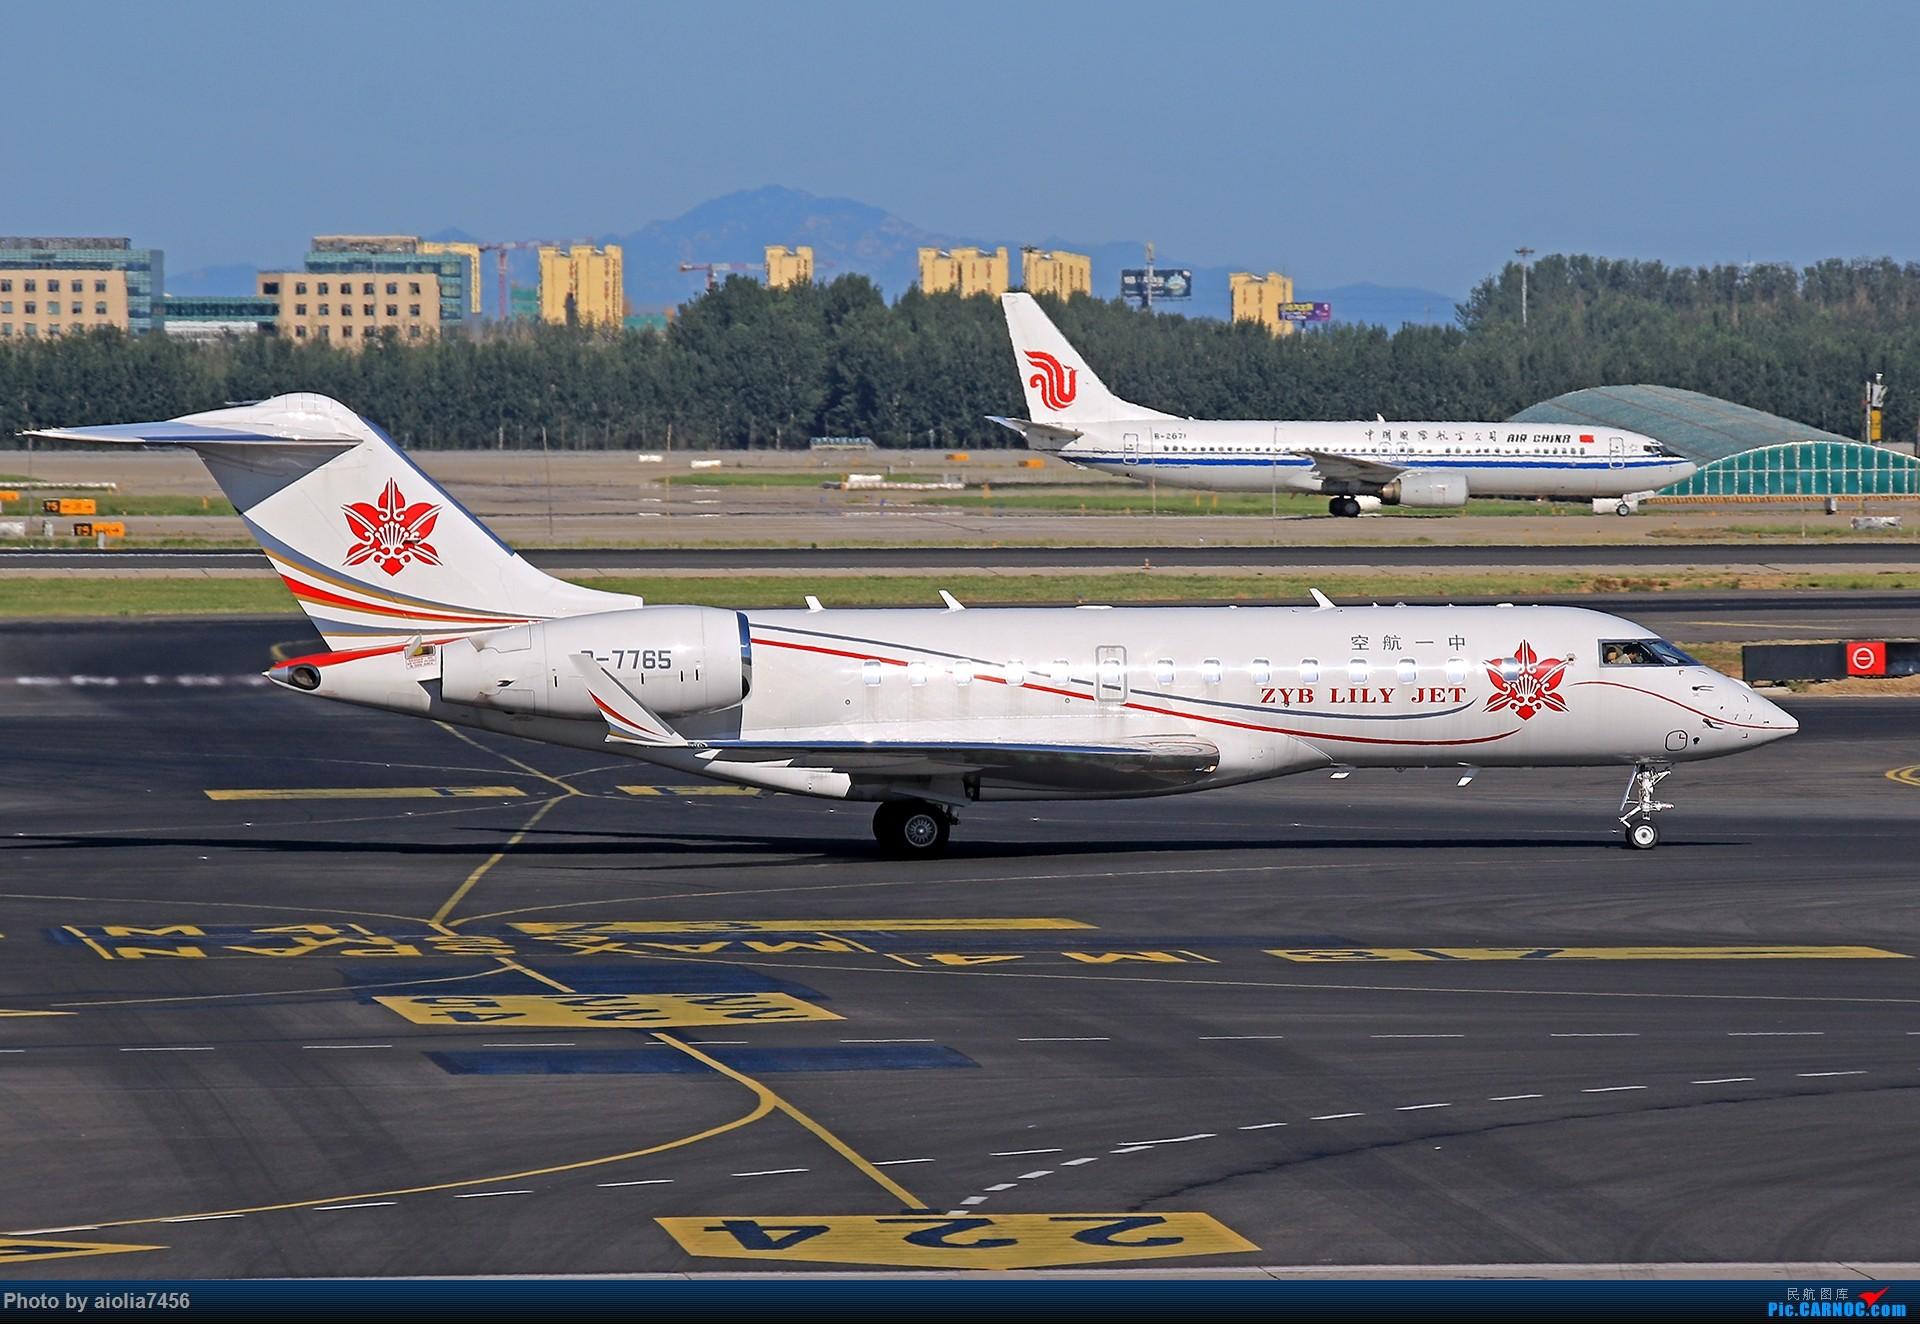 Re:[原创]合肥飞友会[霸都飞友会]冷风过境,吹回了久违的蓝天,而我刚刚好路过PEK BOMBARDIER GLOBAL EXPRESS B-7765 中国北京首都国际机场